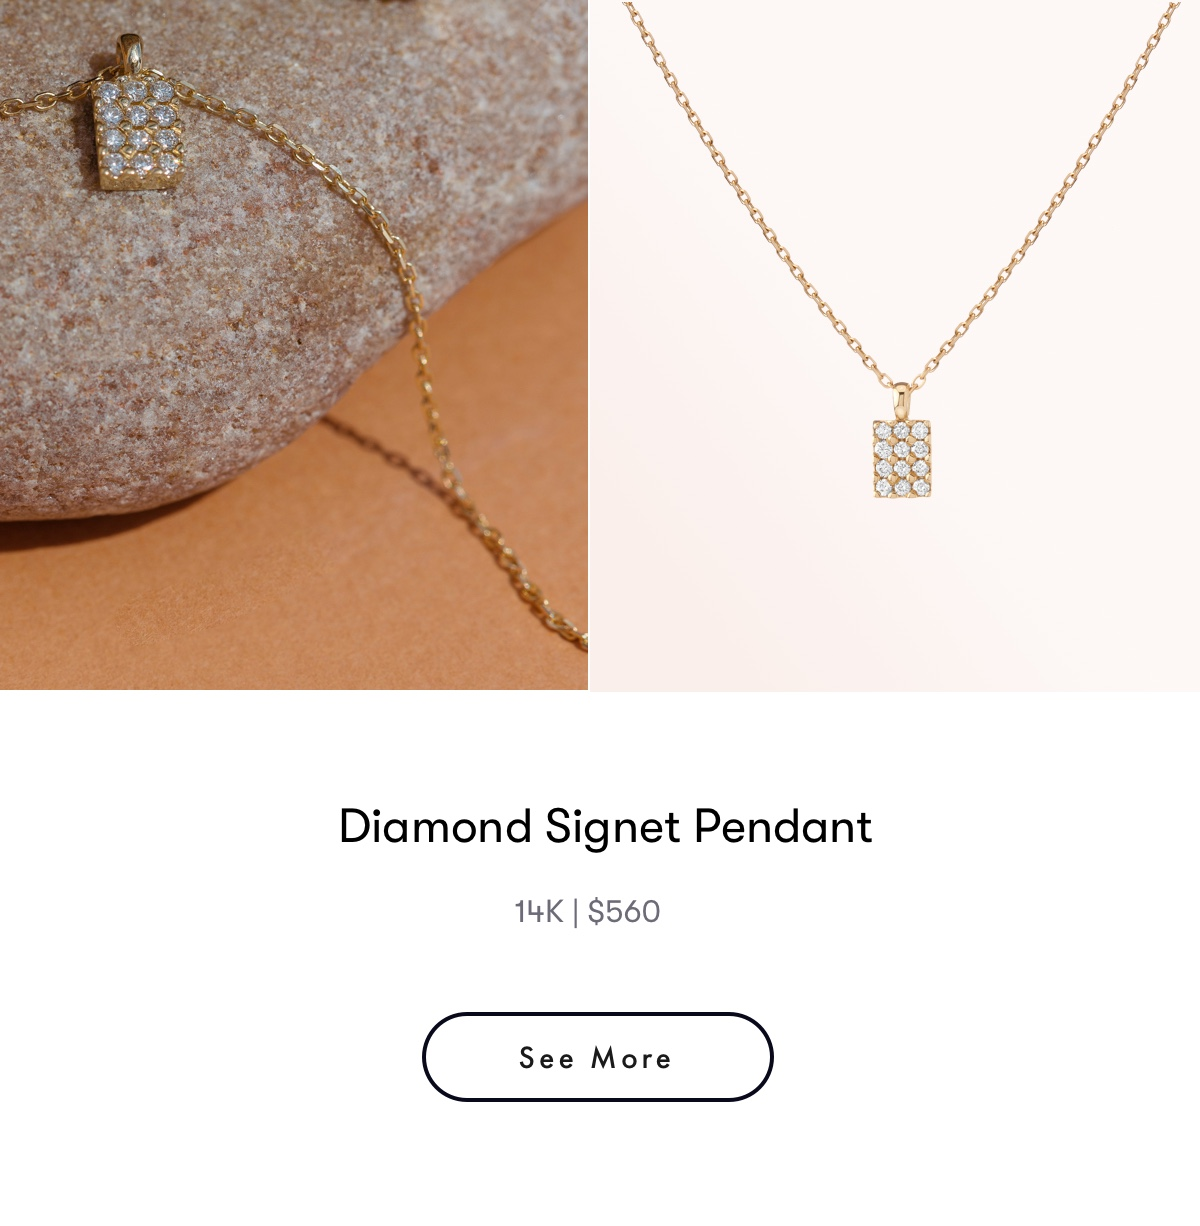 diamond signet pendant